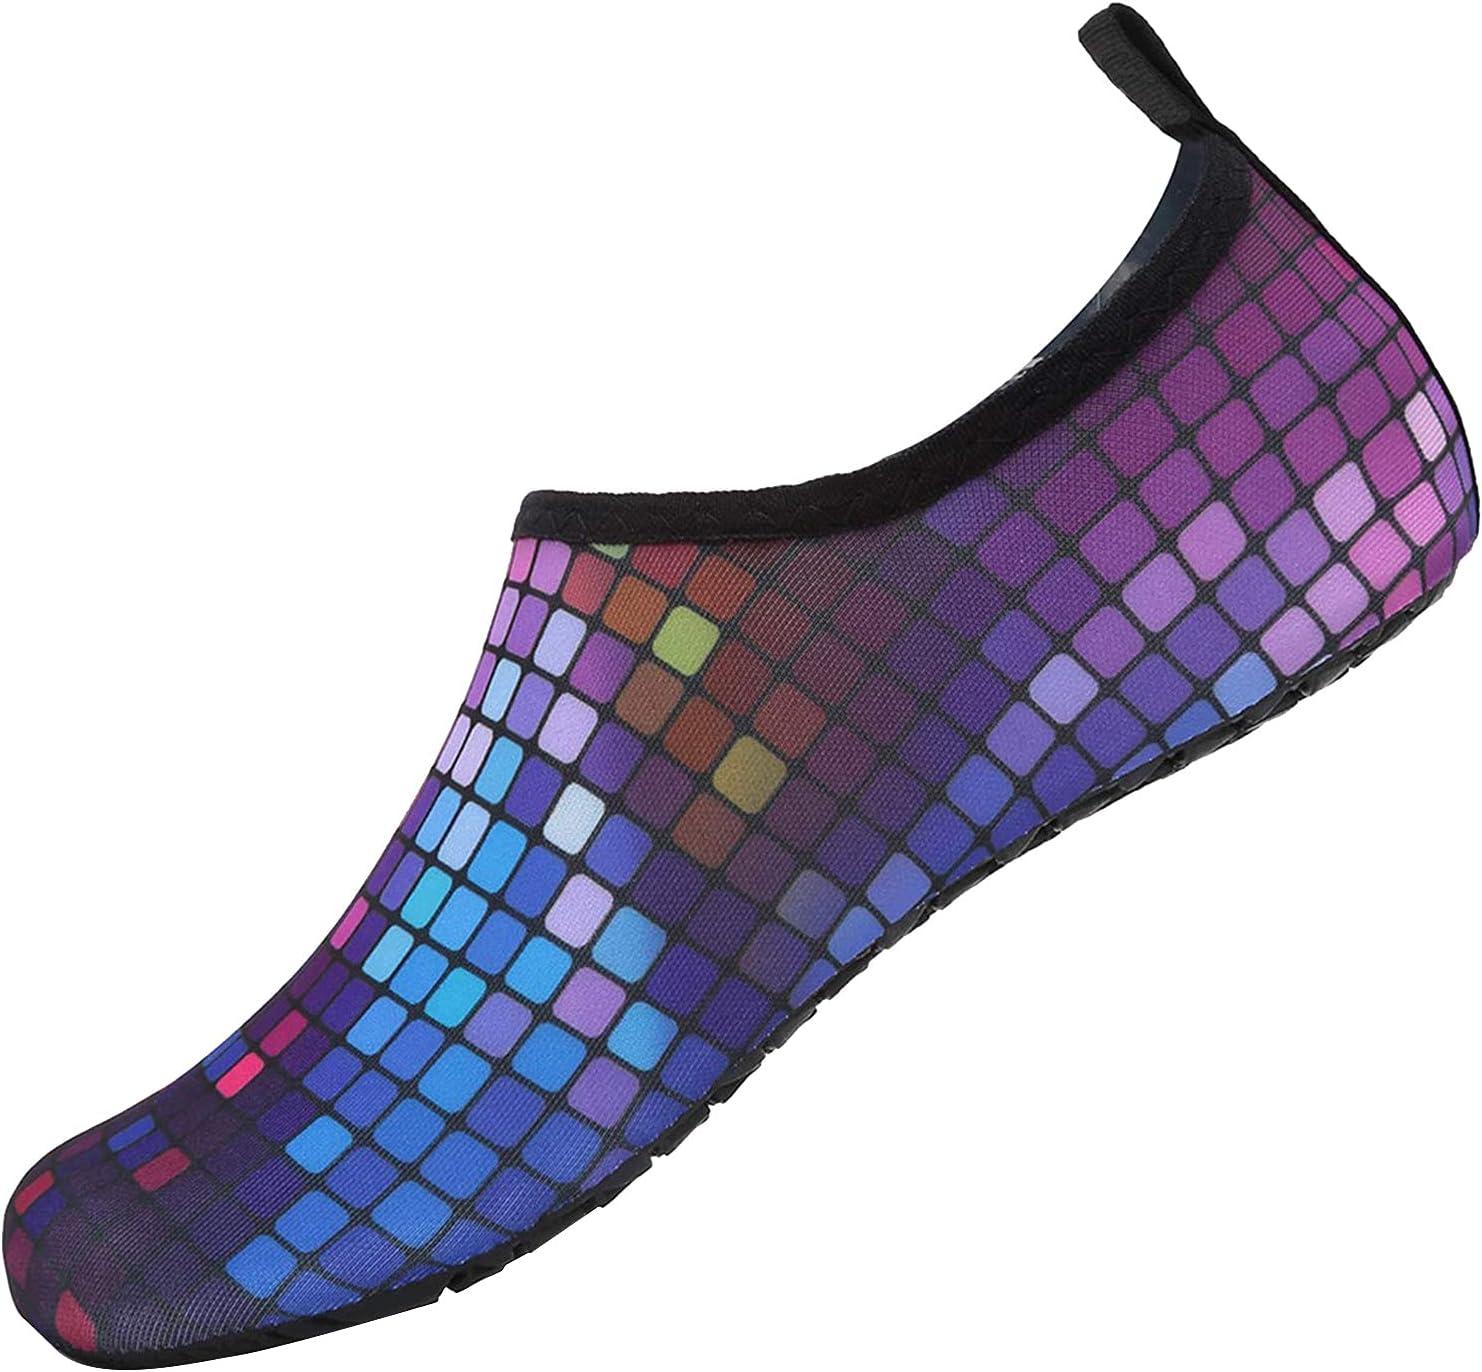 Futurelove Women Men's Print Couple's Dry Dallas Mall Quick Spring new work Soft Socks Baref